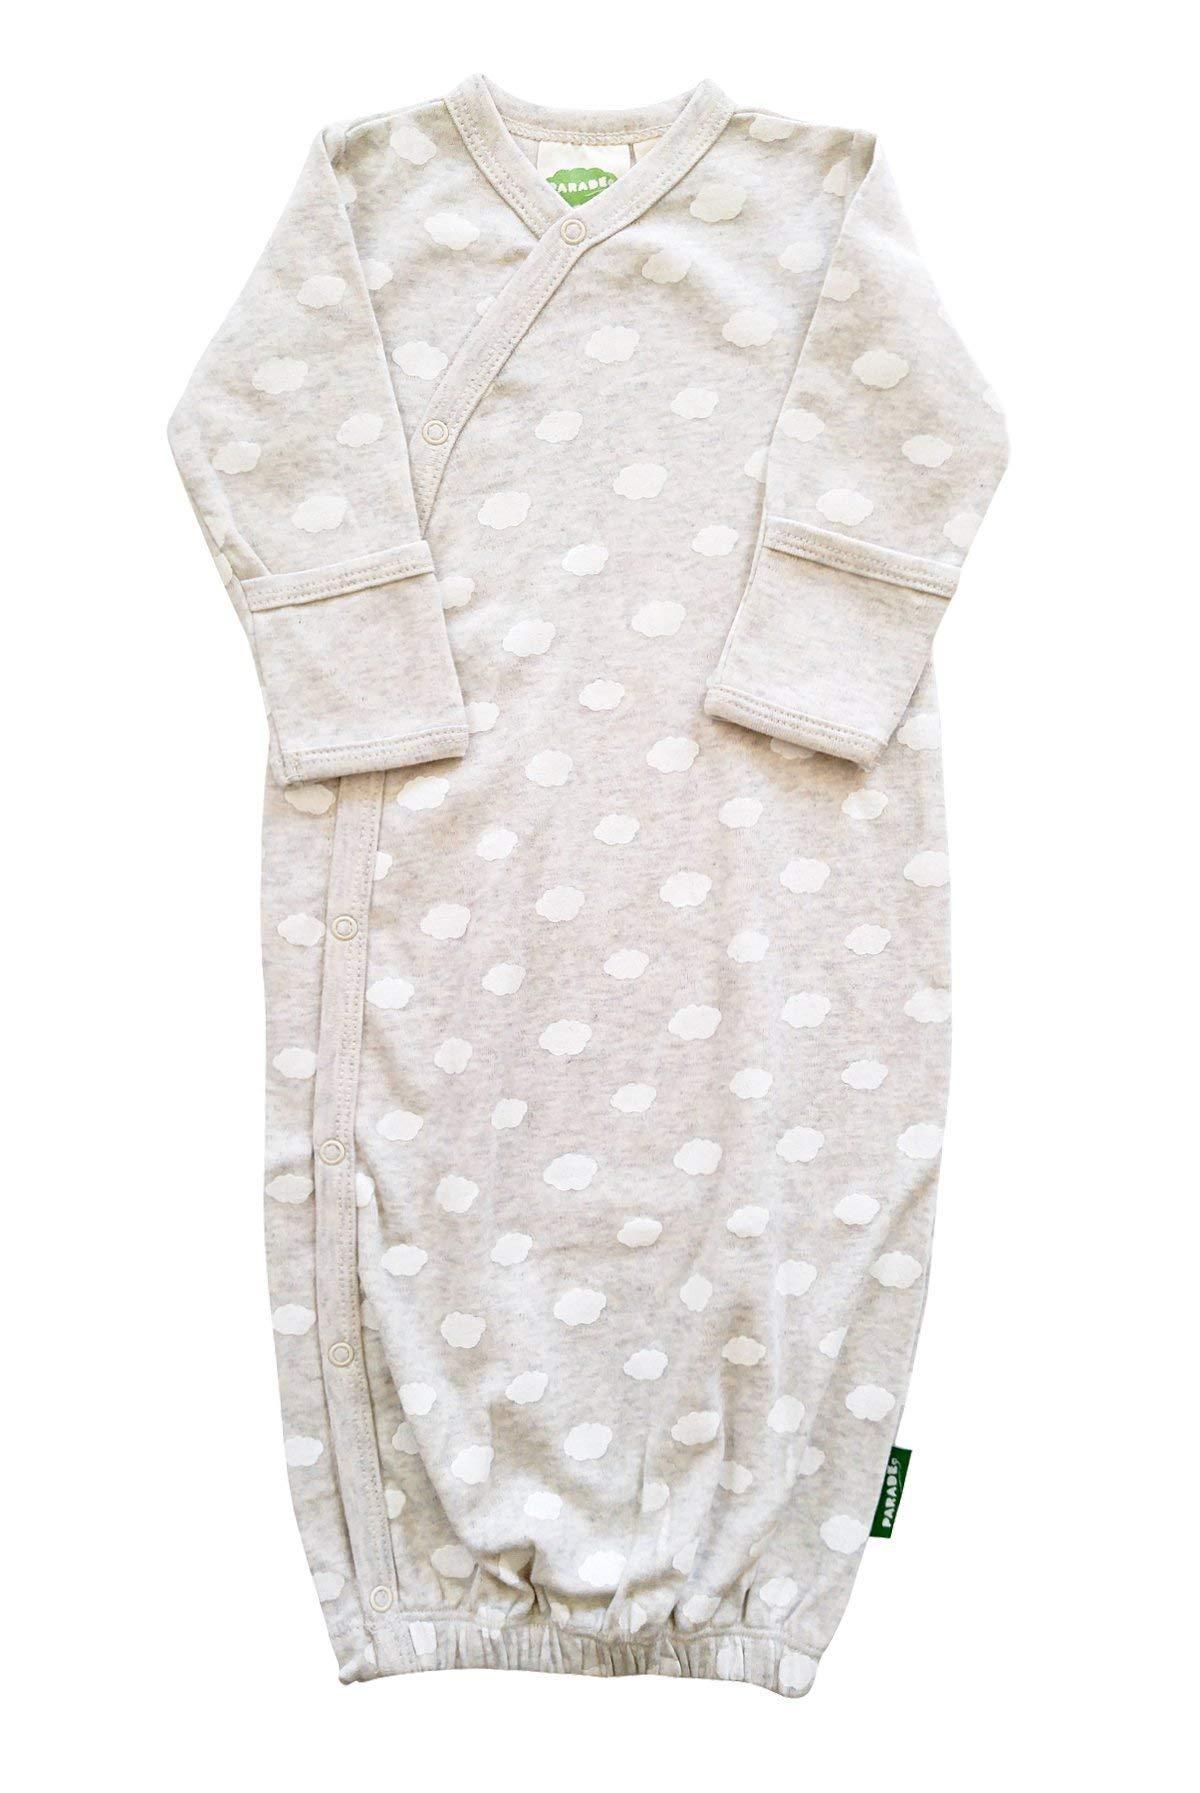 Signature Prints Black Galaxy 0-3 Months PARADE Kimono Gowns